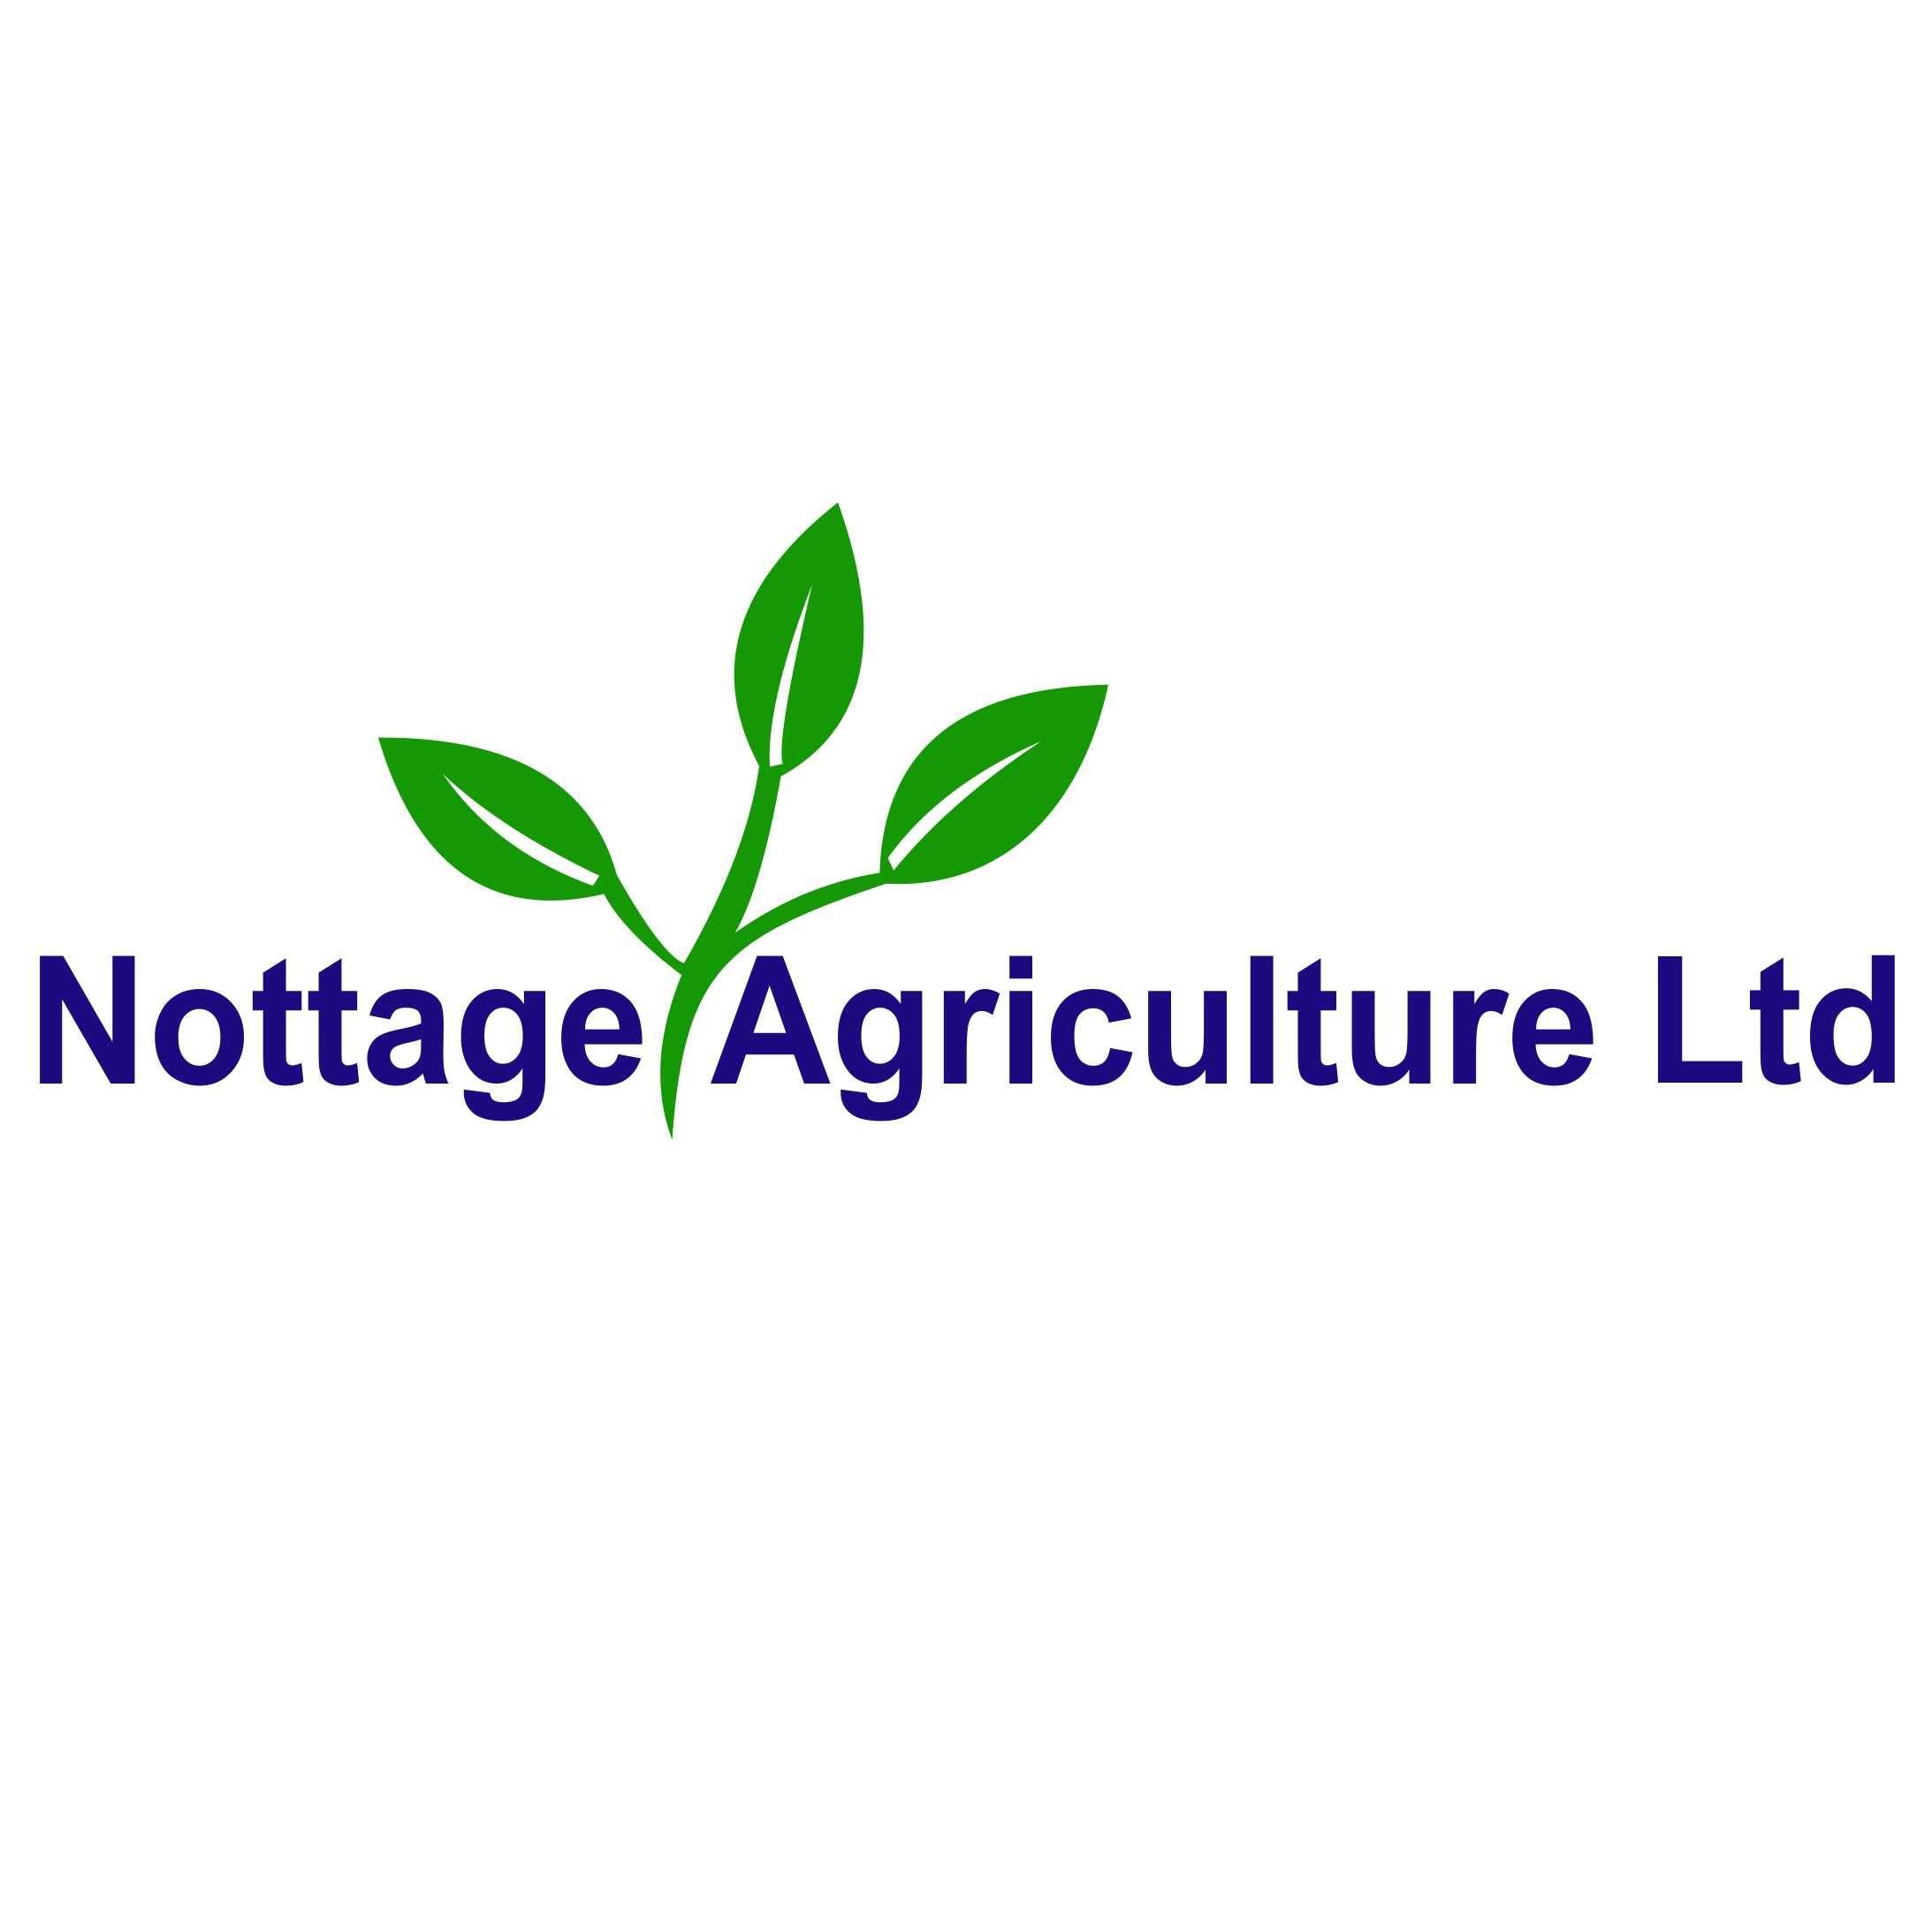 Andrew Nottage - Nottage Agriculture Ltd